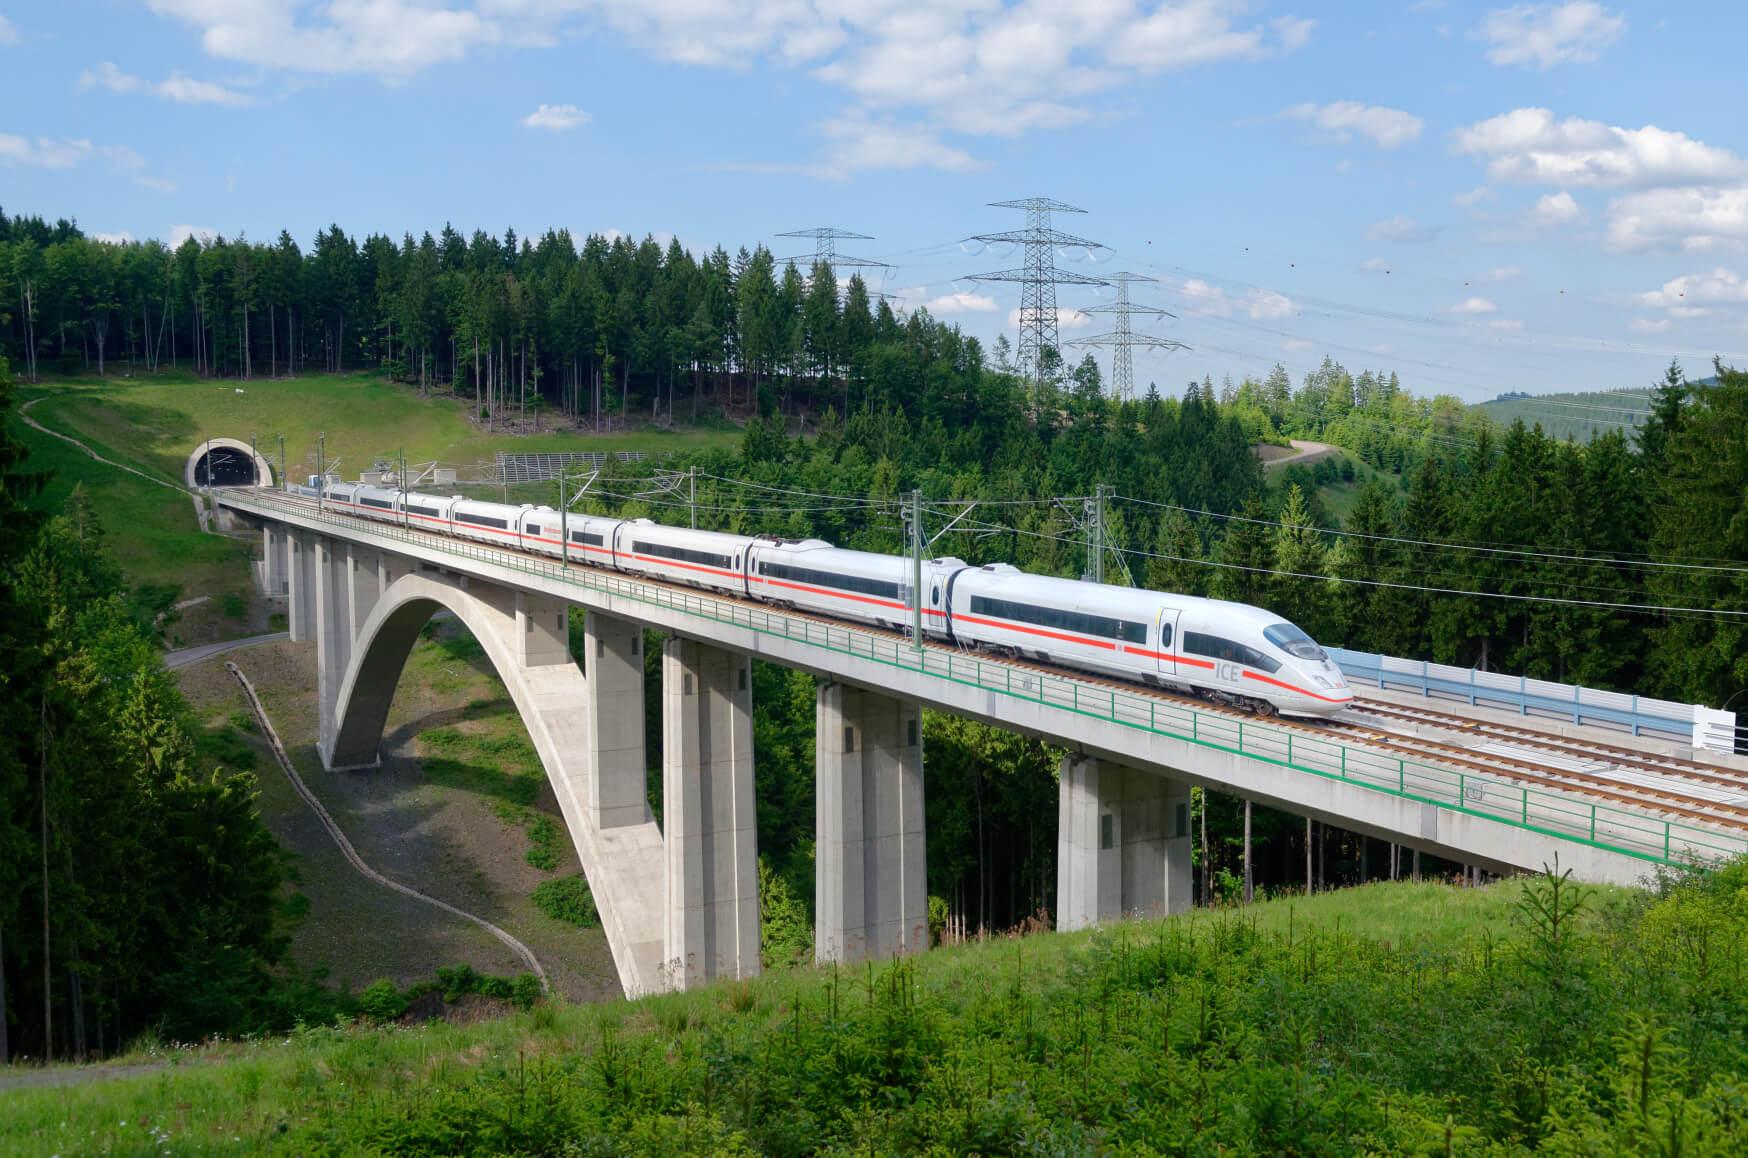 ICE Intercity Express Fernstrecke